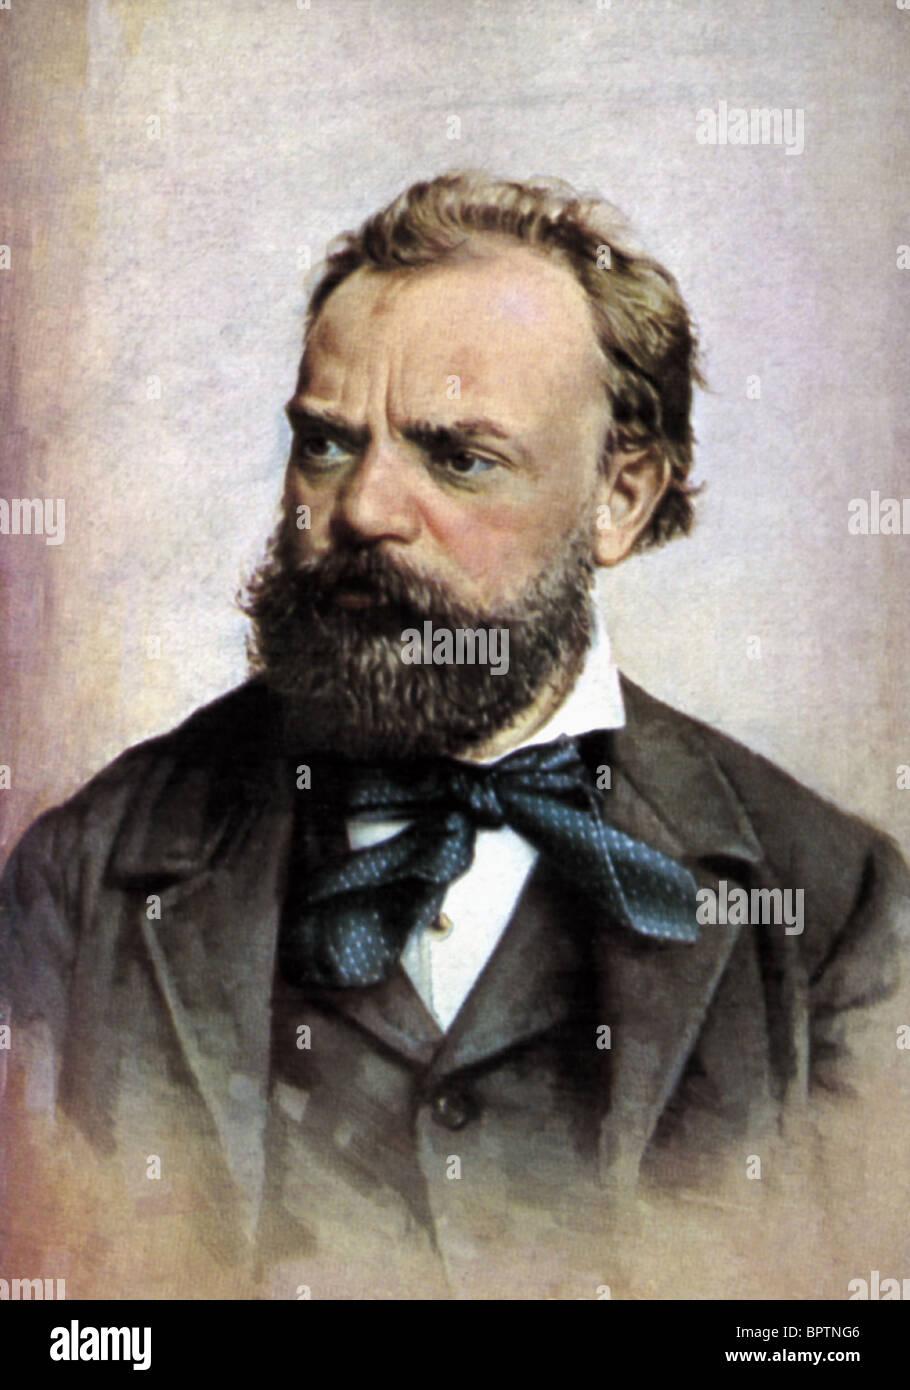 ANTON DVORAK COMPOSER (1882) - Stock Image